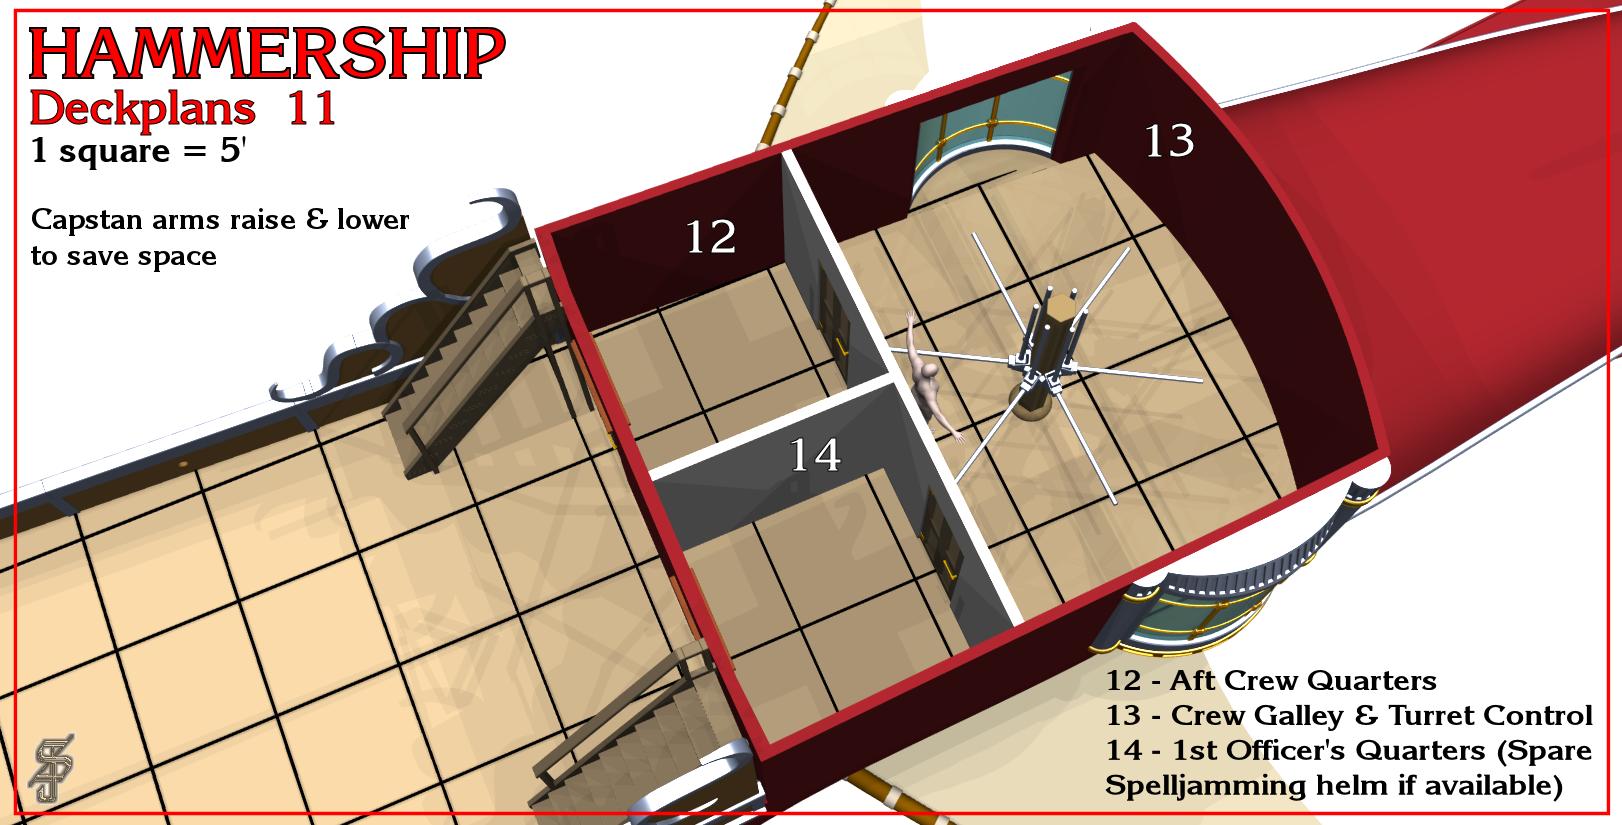 Hammership layout 11